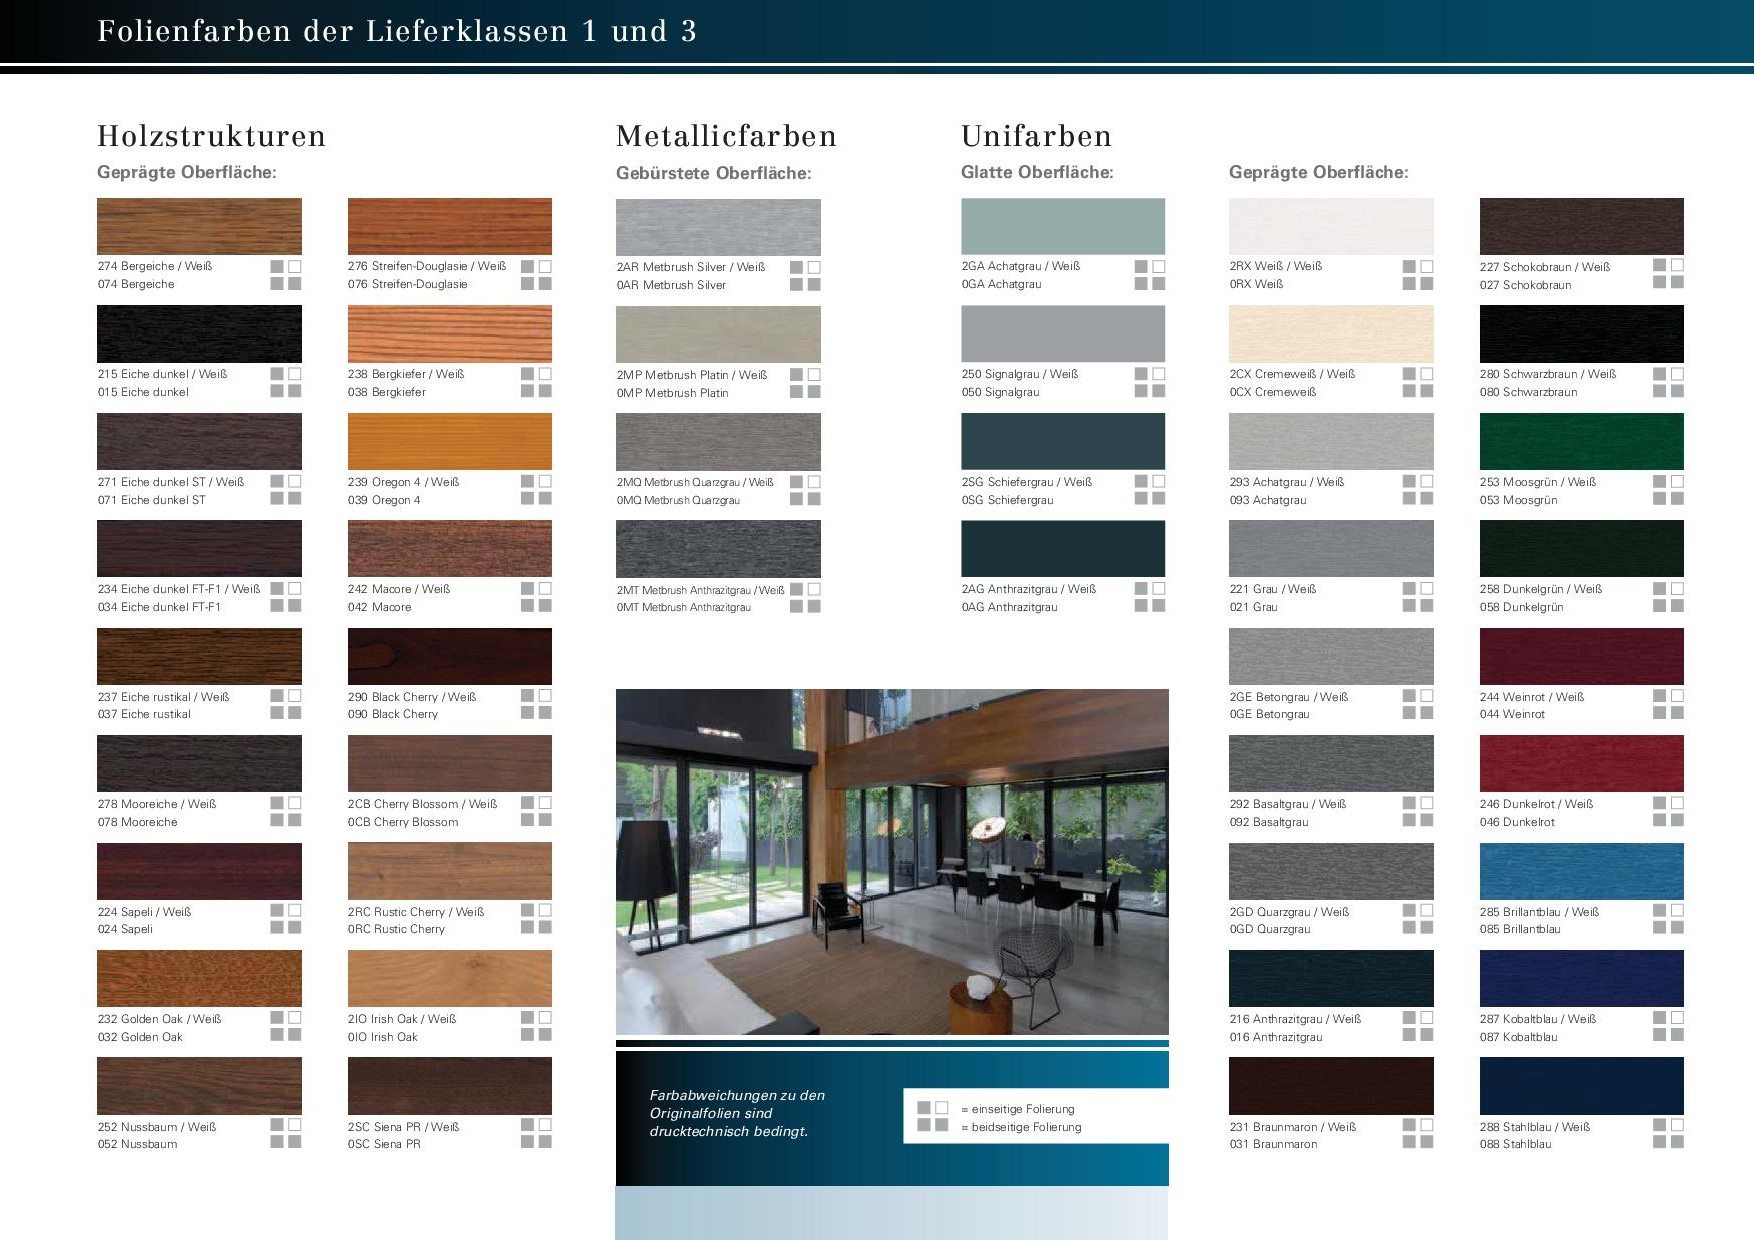 2KOE_prospekt Colorit 08 2013.pdf.pdf